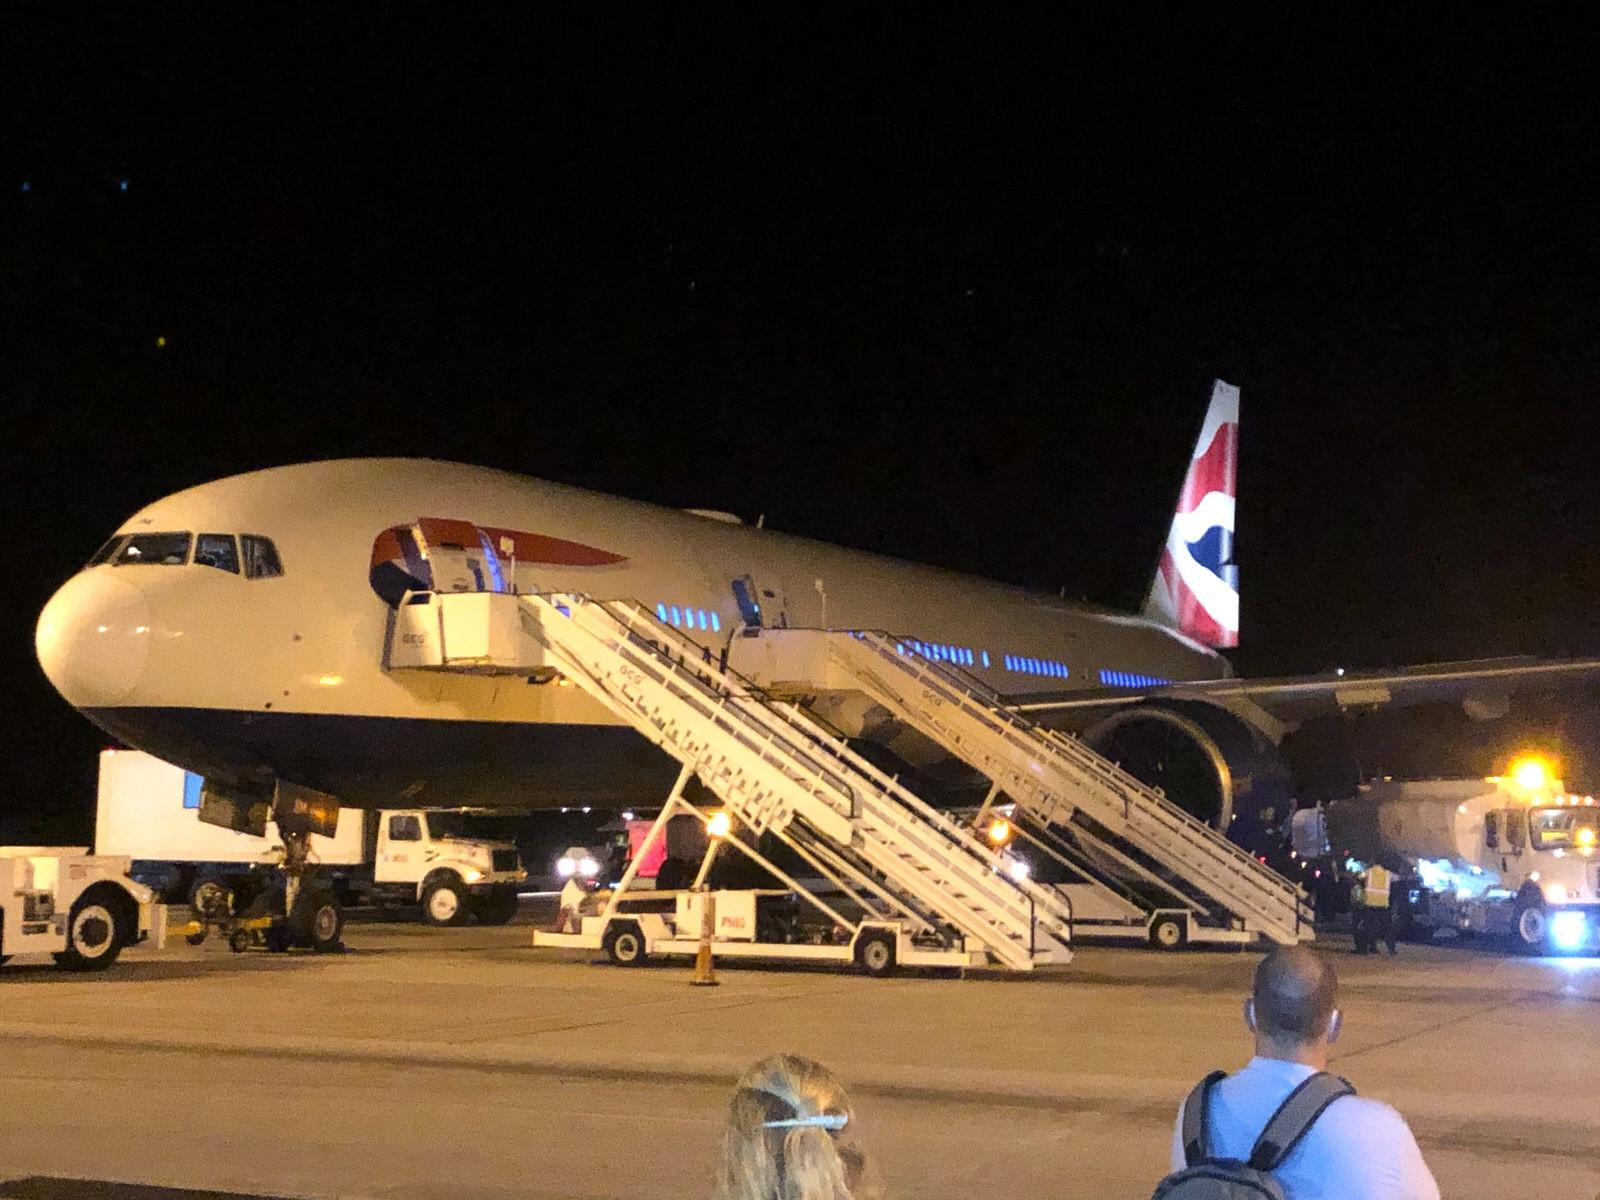 British Airway plane at Barbados Grantley Adams International Airport preparing to fly back to London Heathrow